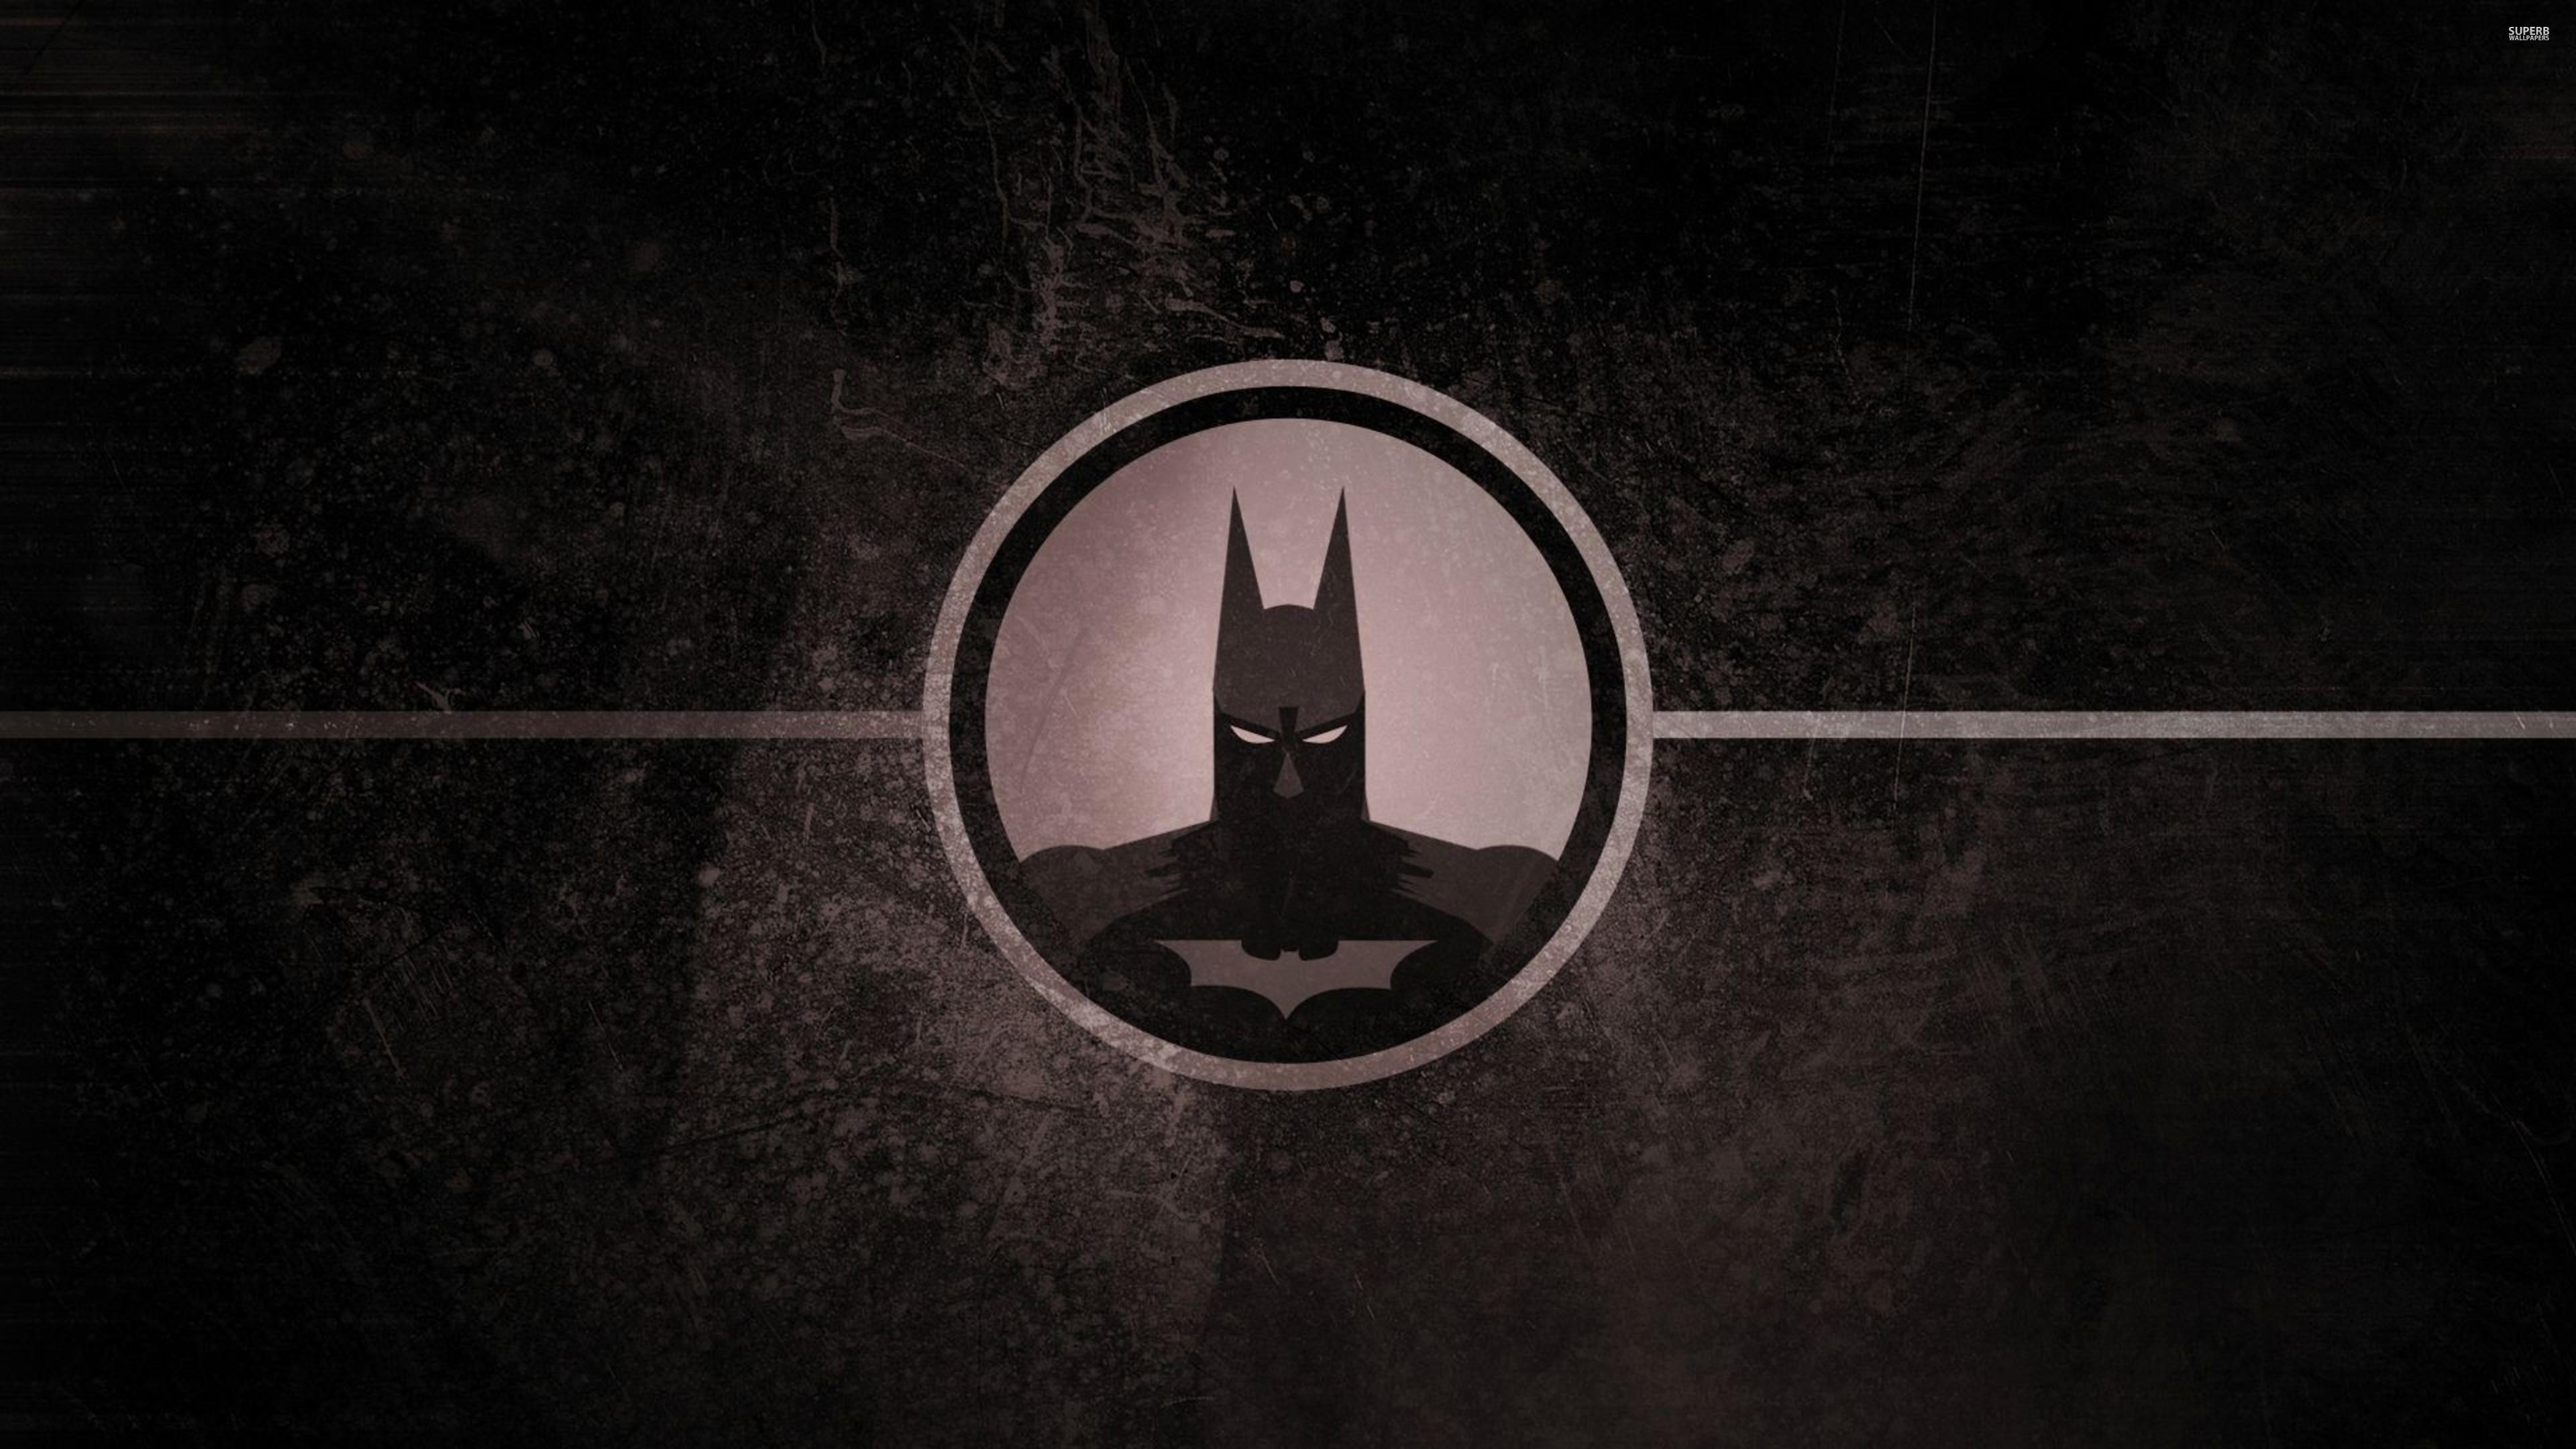 batman art 1540748190 - Batman Art - logo wallpapers, digital art wallpapers, batman wallpapers, artist wallpapers